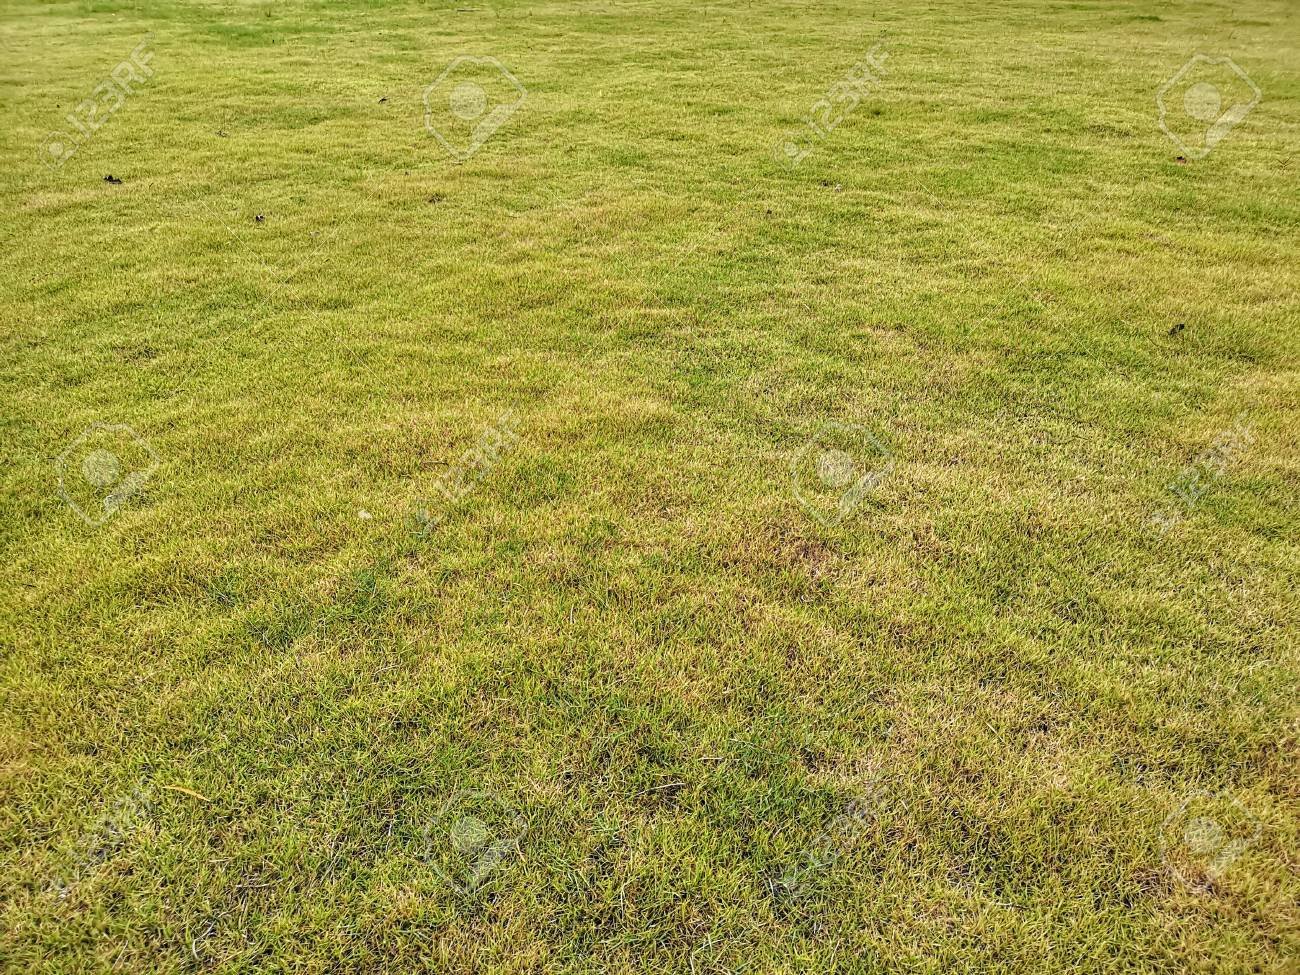 Empty fresh green grass field bakground - 105929046